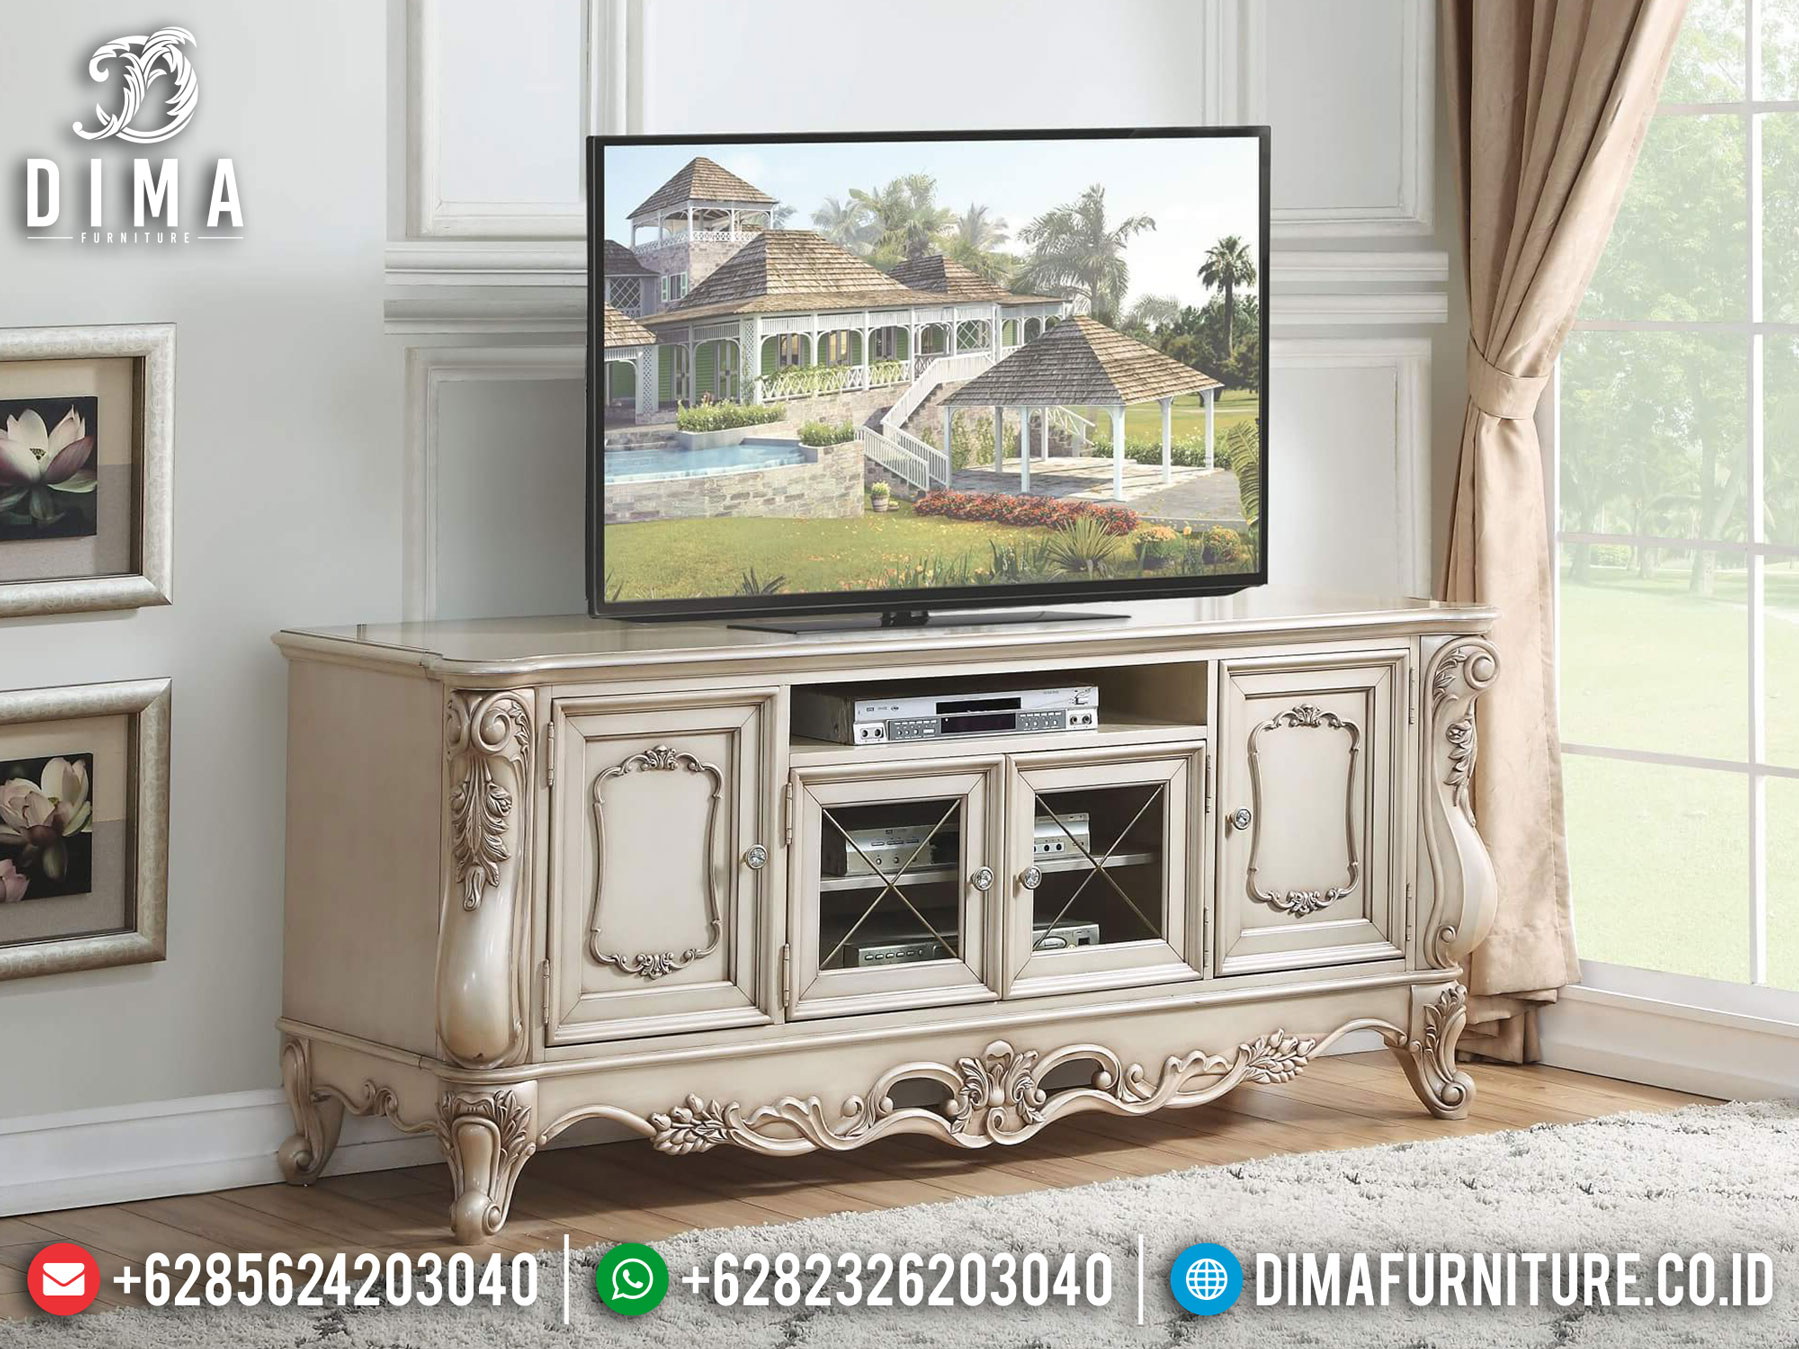 New Meja TV Ukir Luxury Classic Mebel Jepara Terbaru TTJ-1036